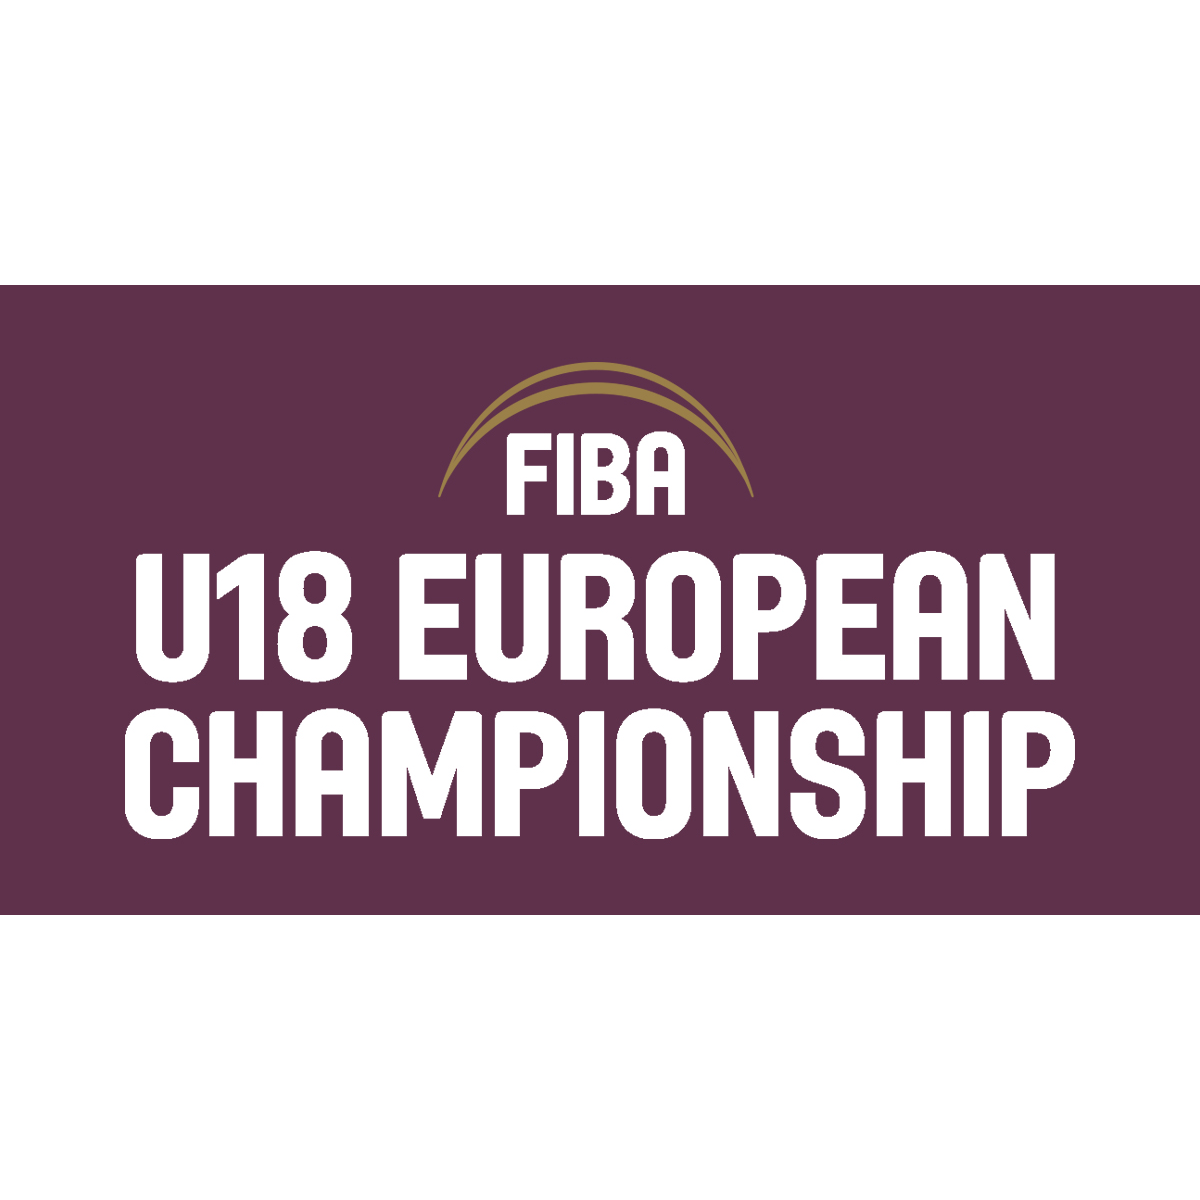 2016 FIBA U18 European Basketball Championship - Division B